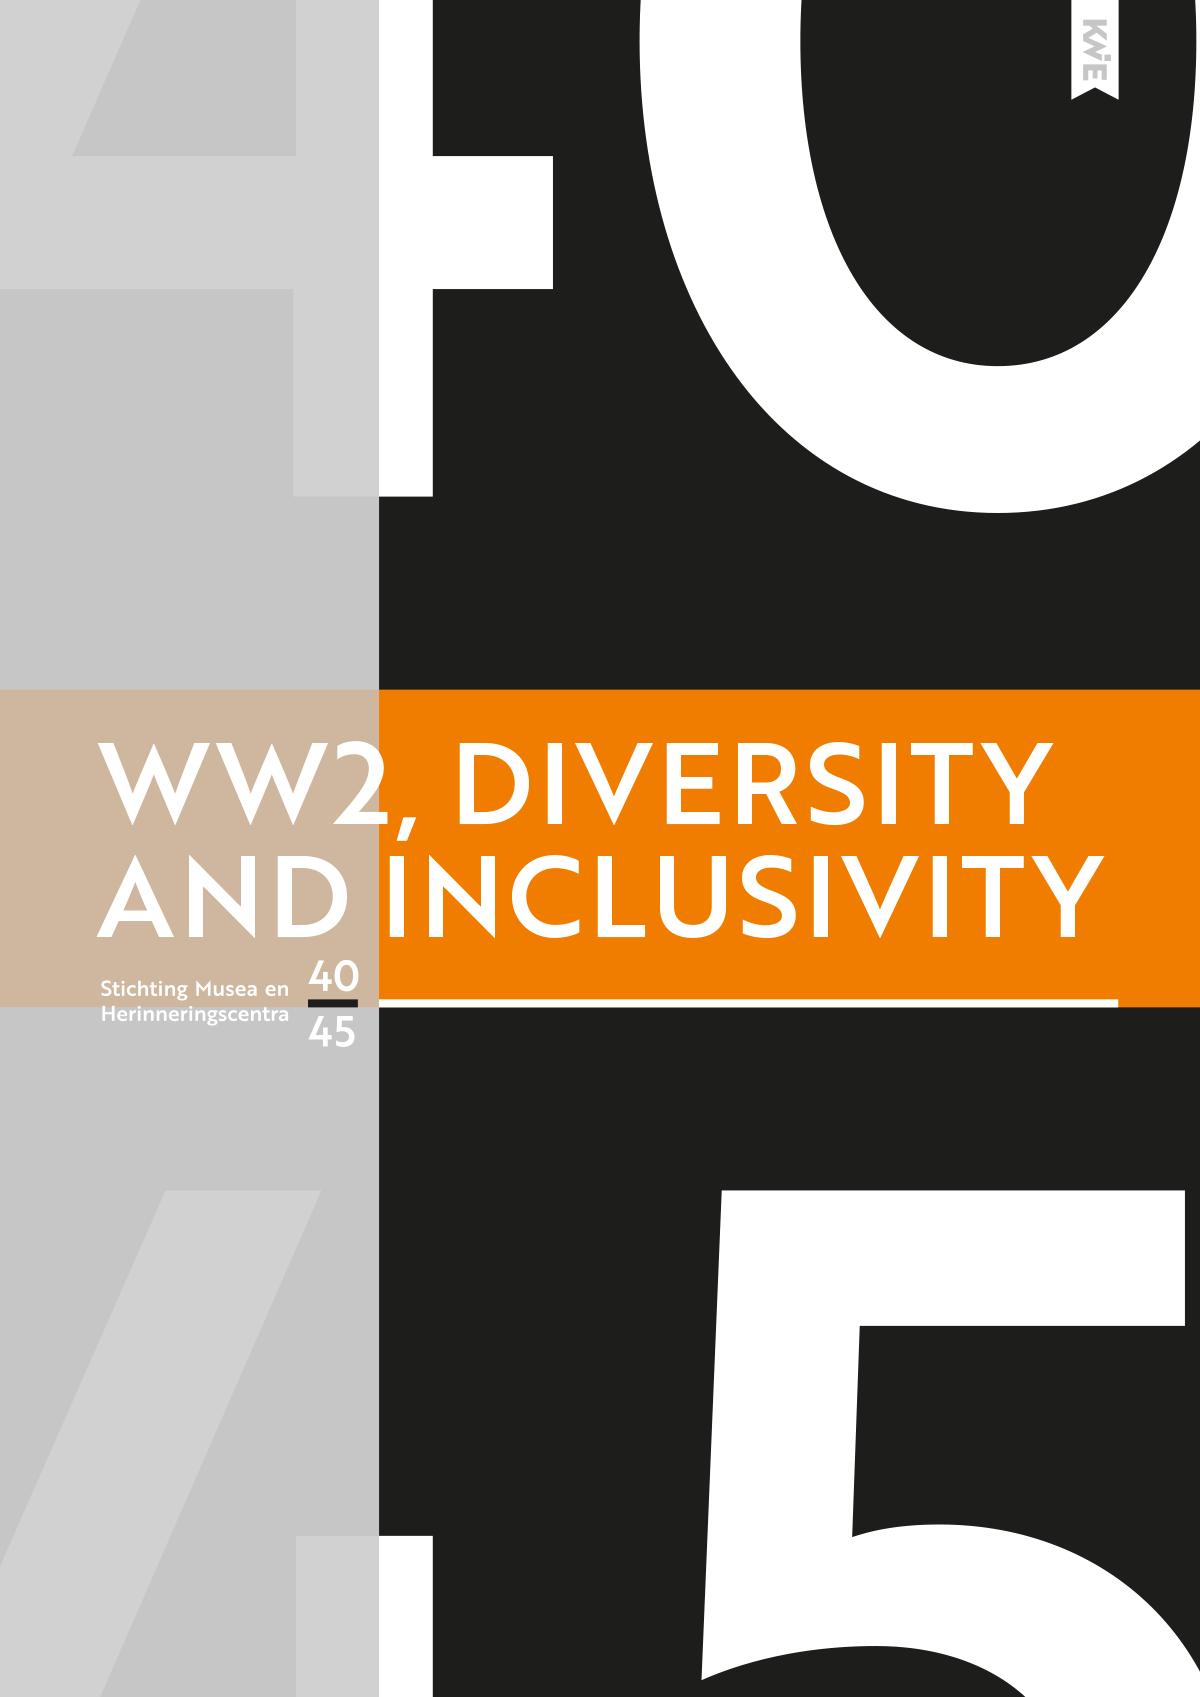 WW2, diversity and inclusivity